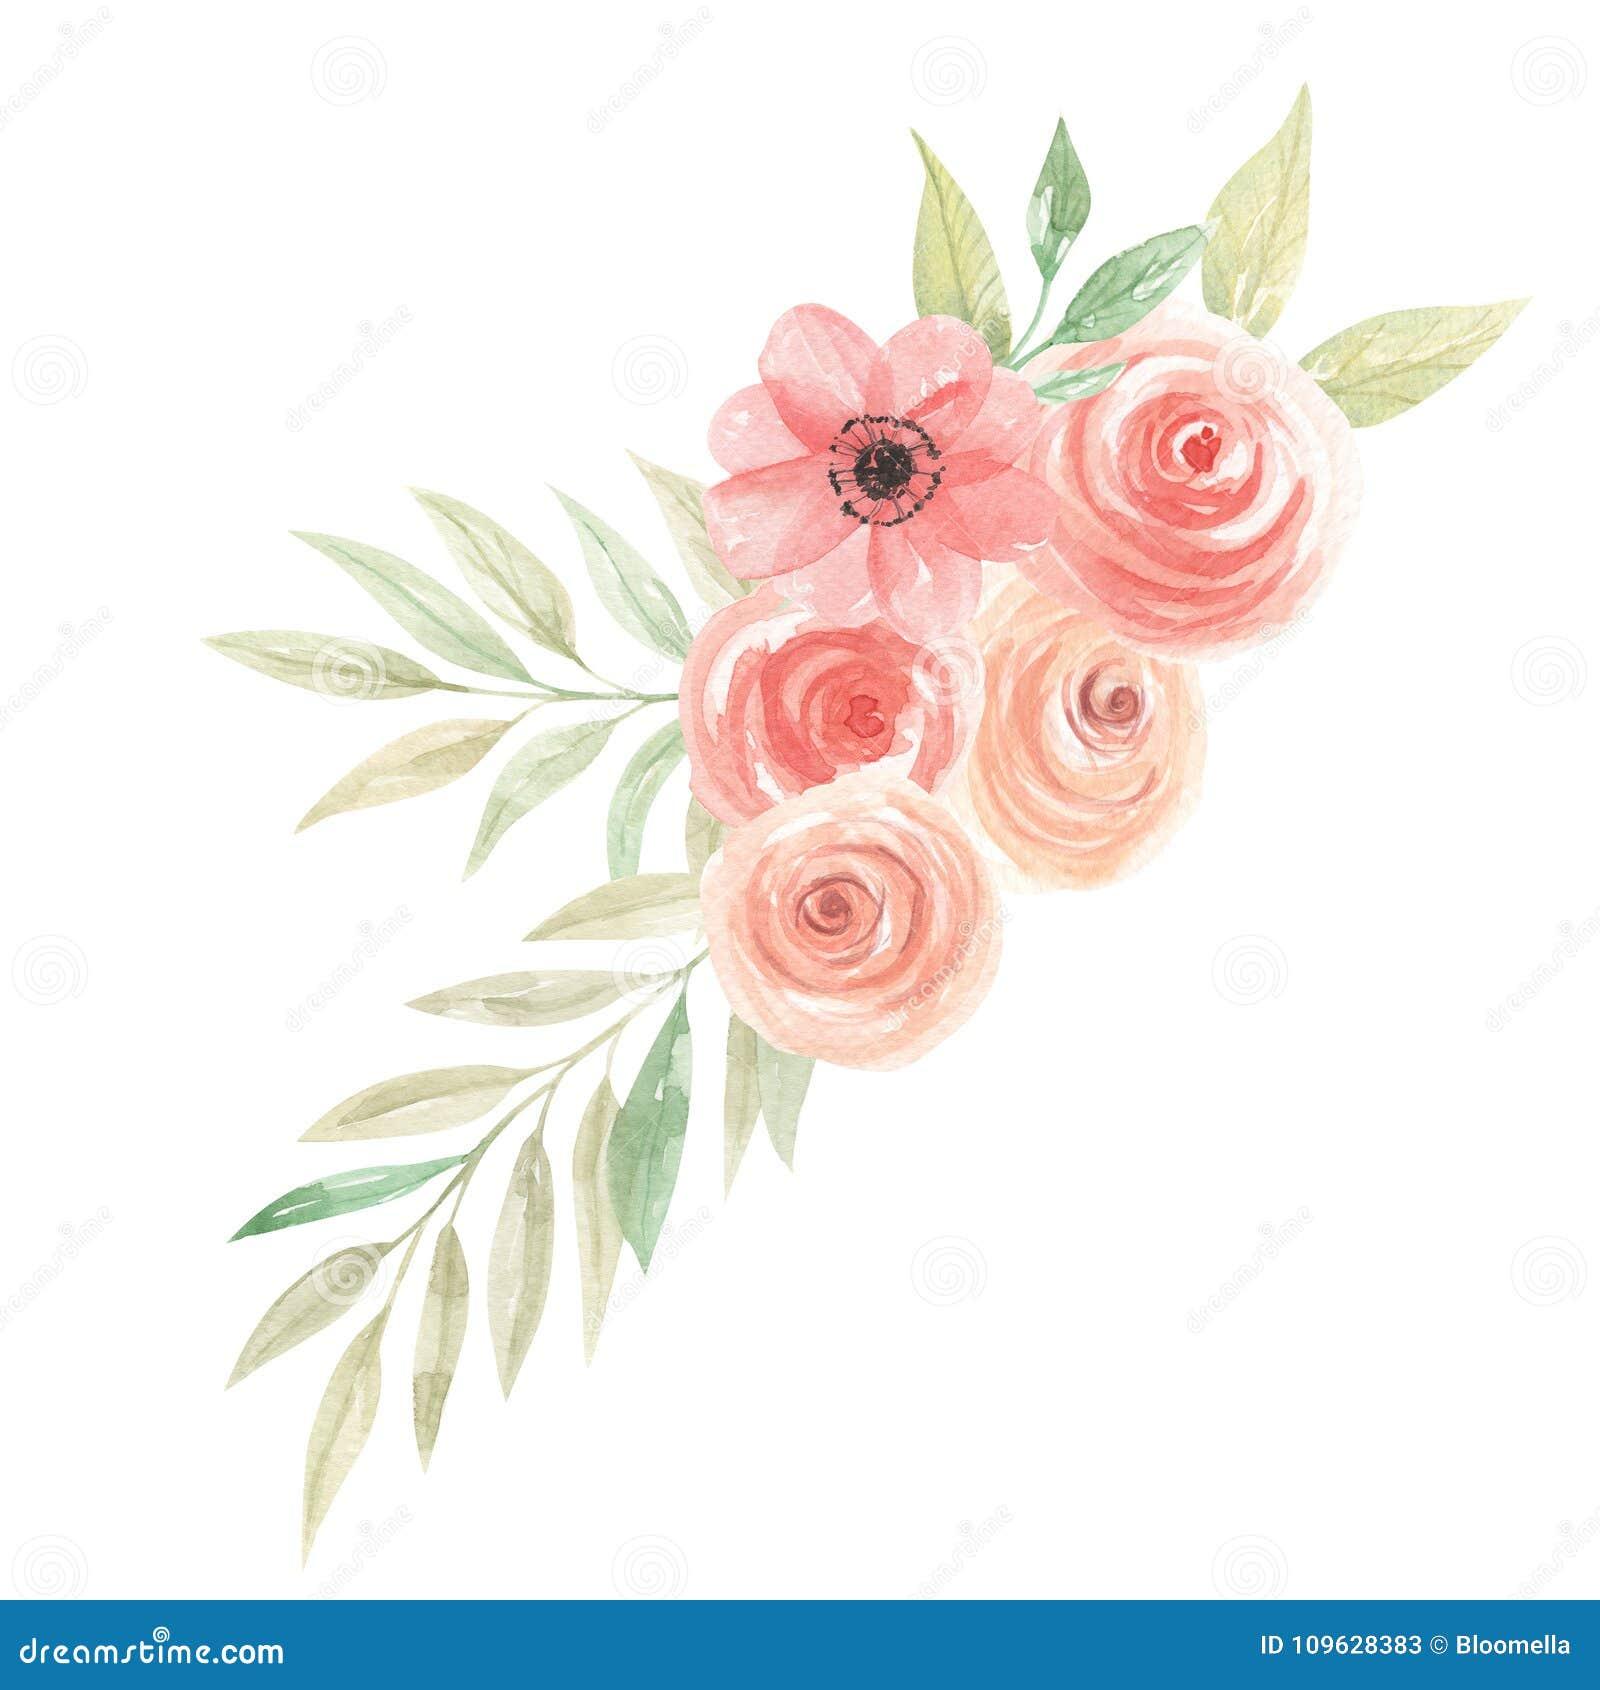 watercolor flowers peach bouquet floral coral painted